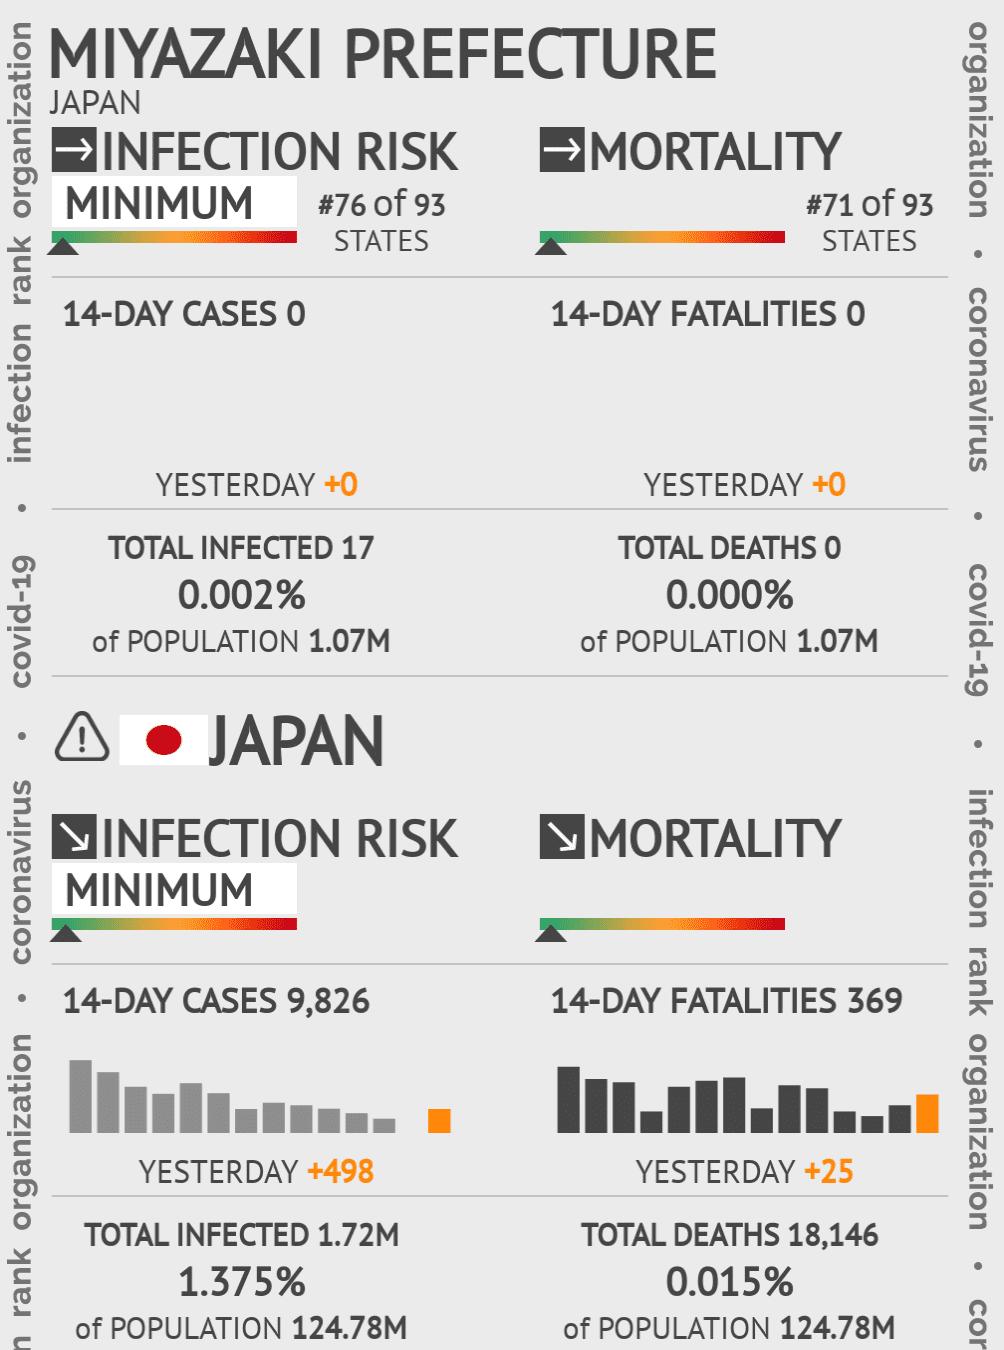 Miyazaki Prefecture Coronavirus Covid-19 Risk of Infection on May 14, 2020